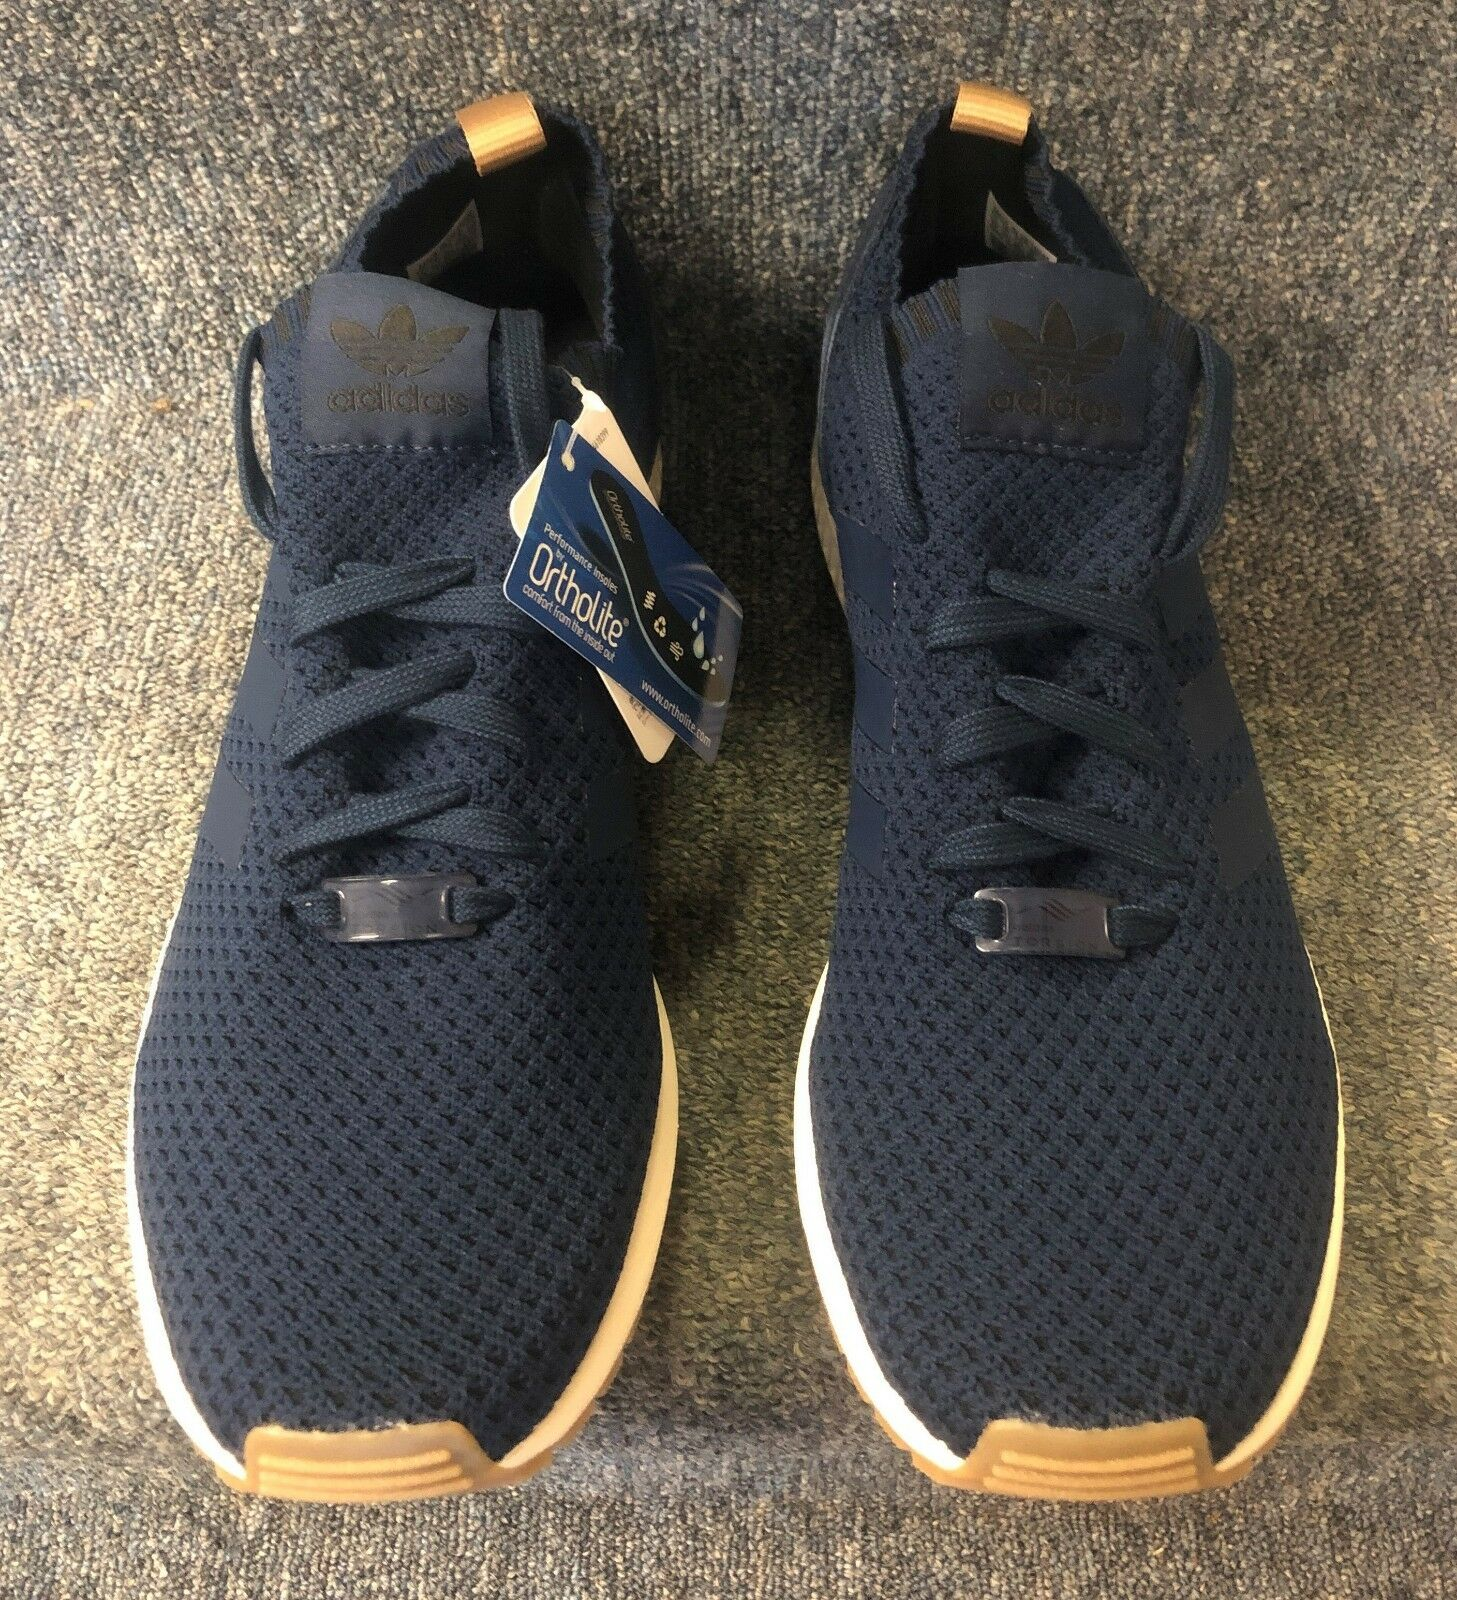 finest selection 6c9f2 5b57c Adidas Adidas Adidas Originals Men s Zx Flux Pk Fashion Sneaker-Navy-NWB  FREE SHIPPING